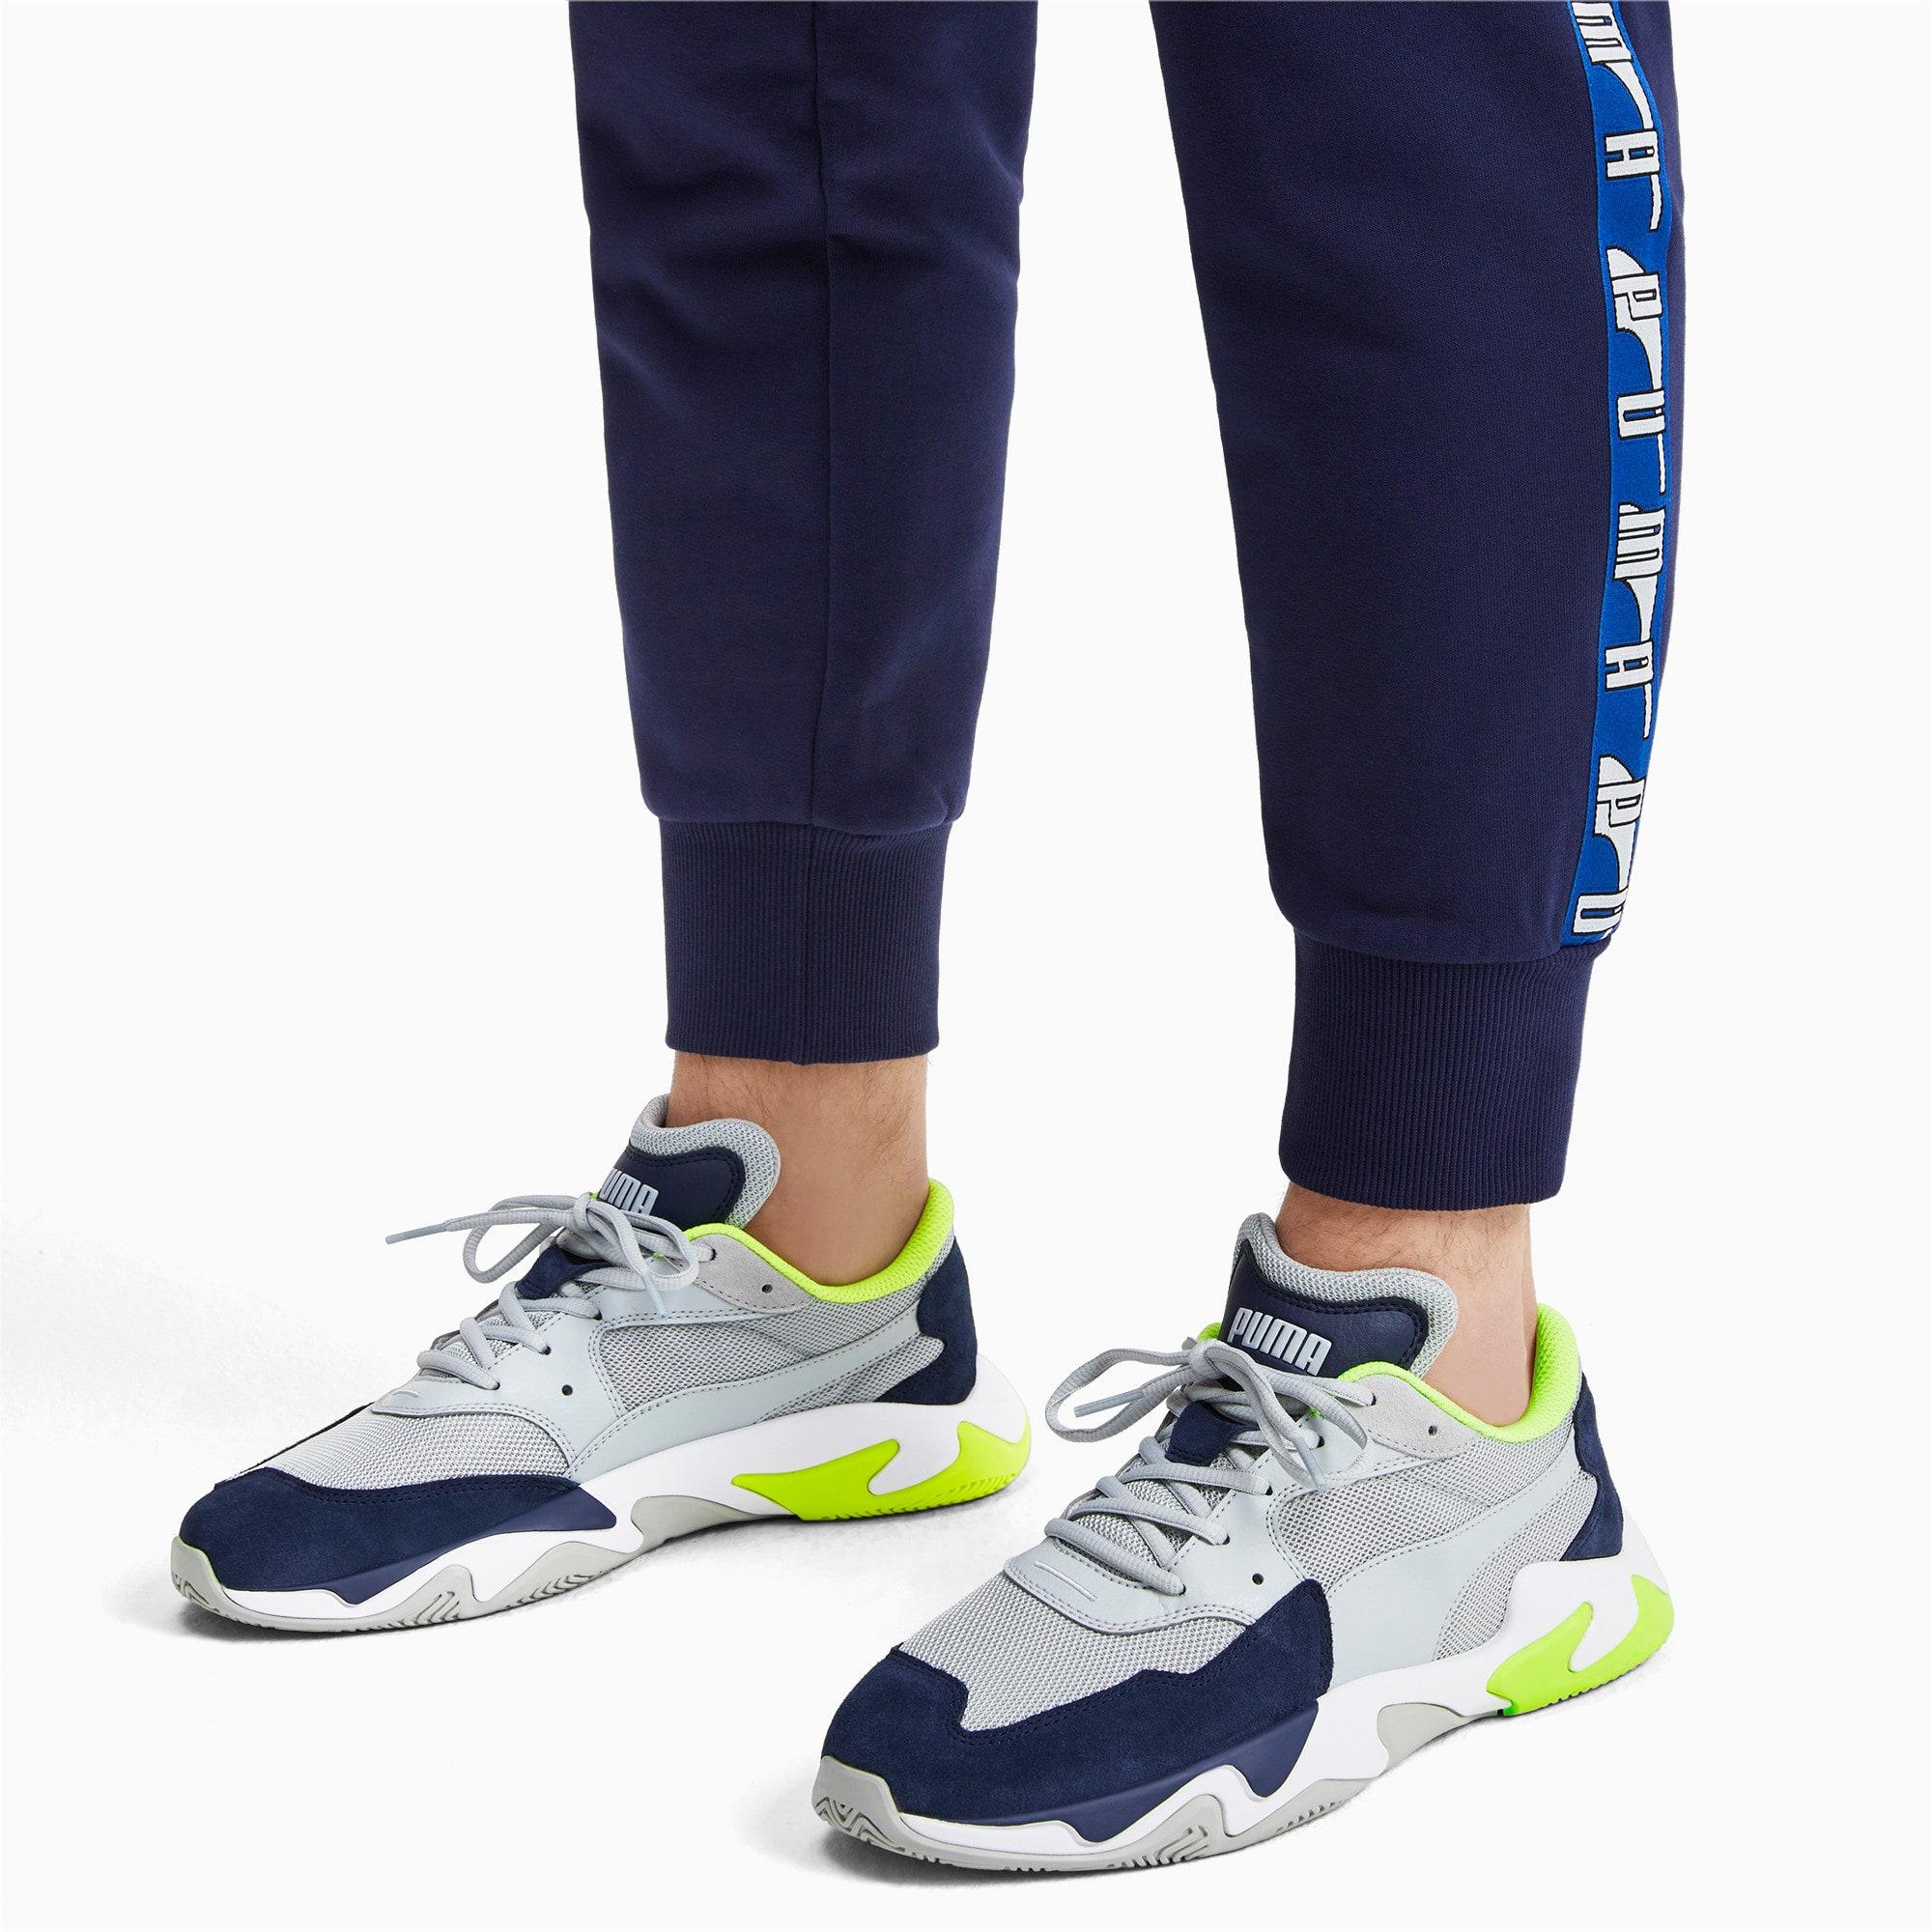 Thumbnail 3 of Storm Adrenaline Sneakers, Peacoat-High Rise, medium